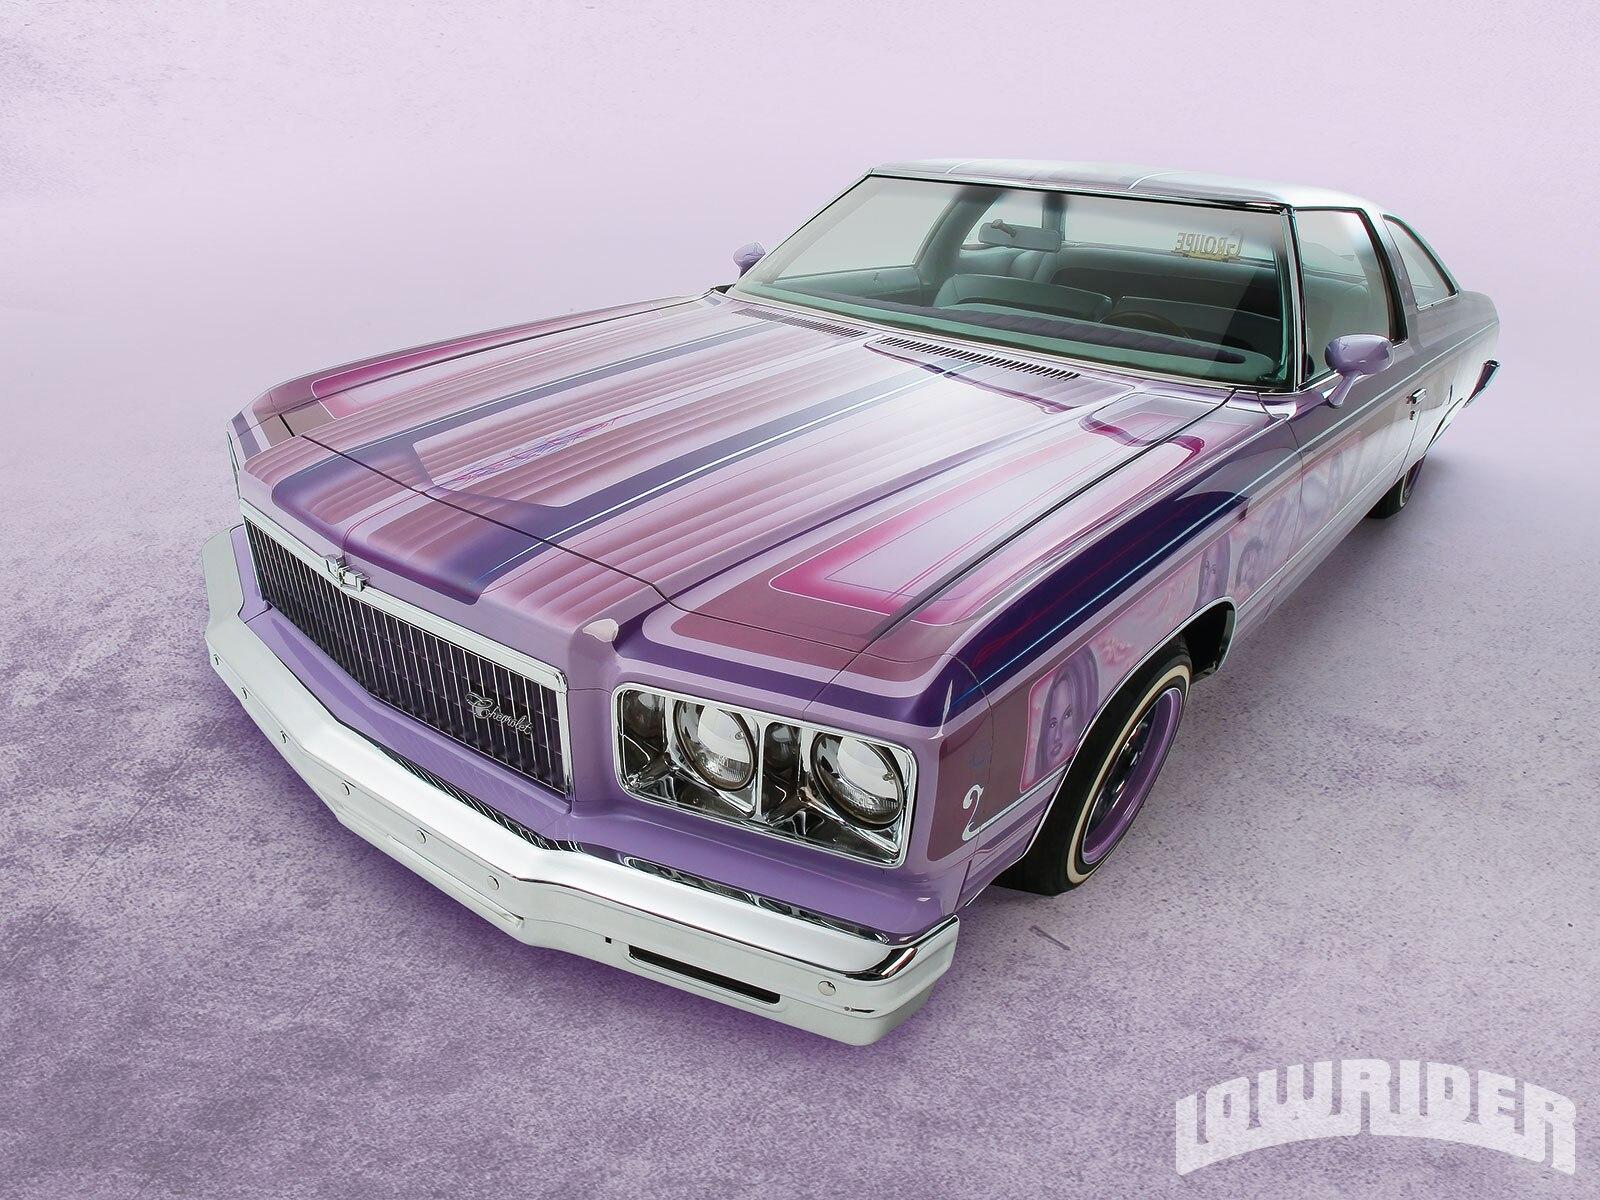 1302-lrmp-06-o-1975-chevrolet-impala-1975-chevy-impala-front-view1